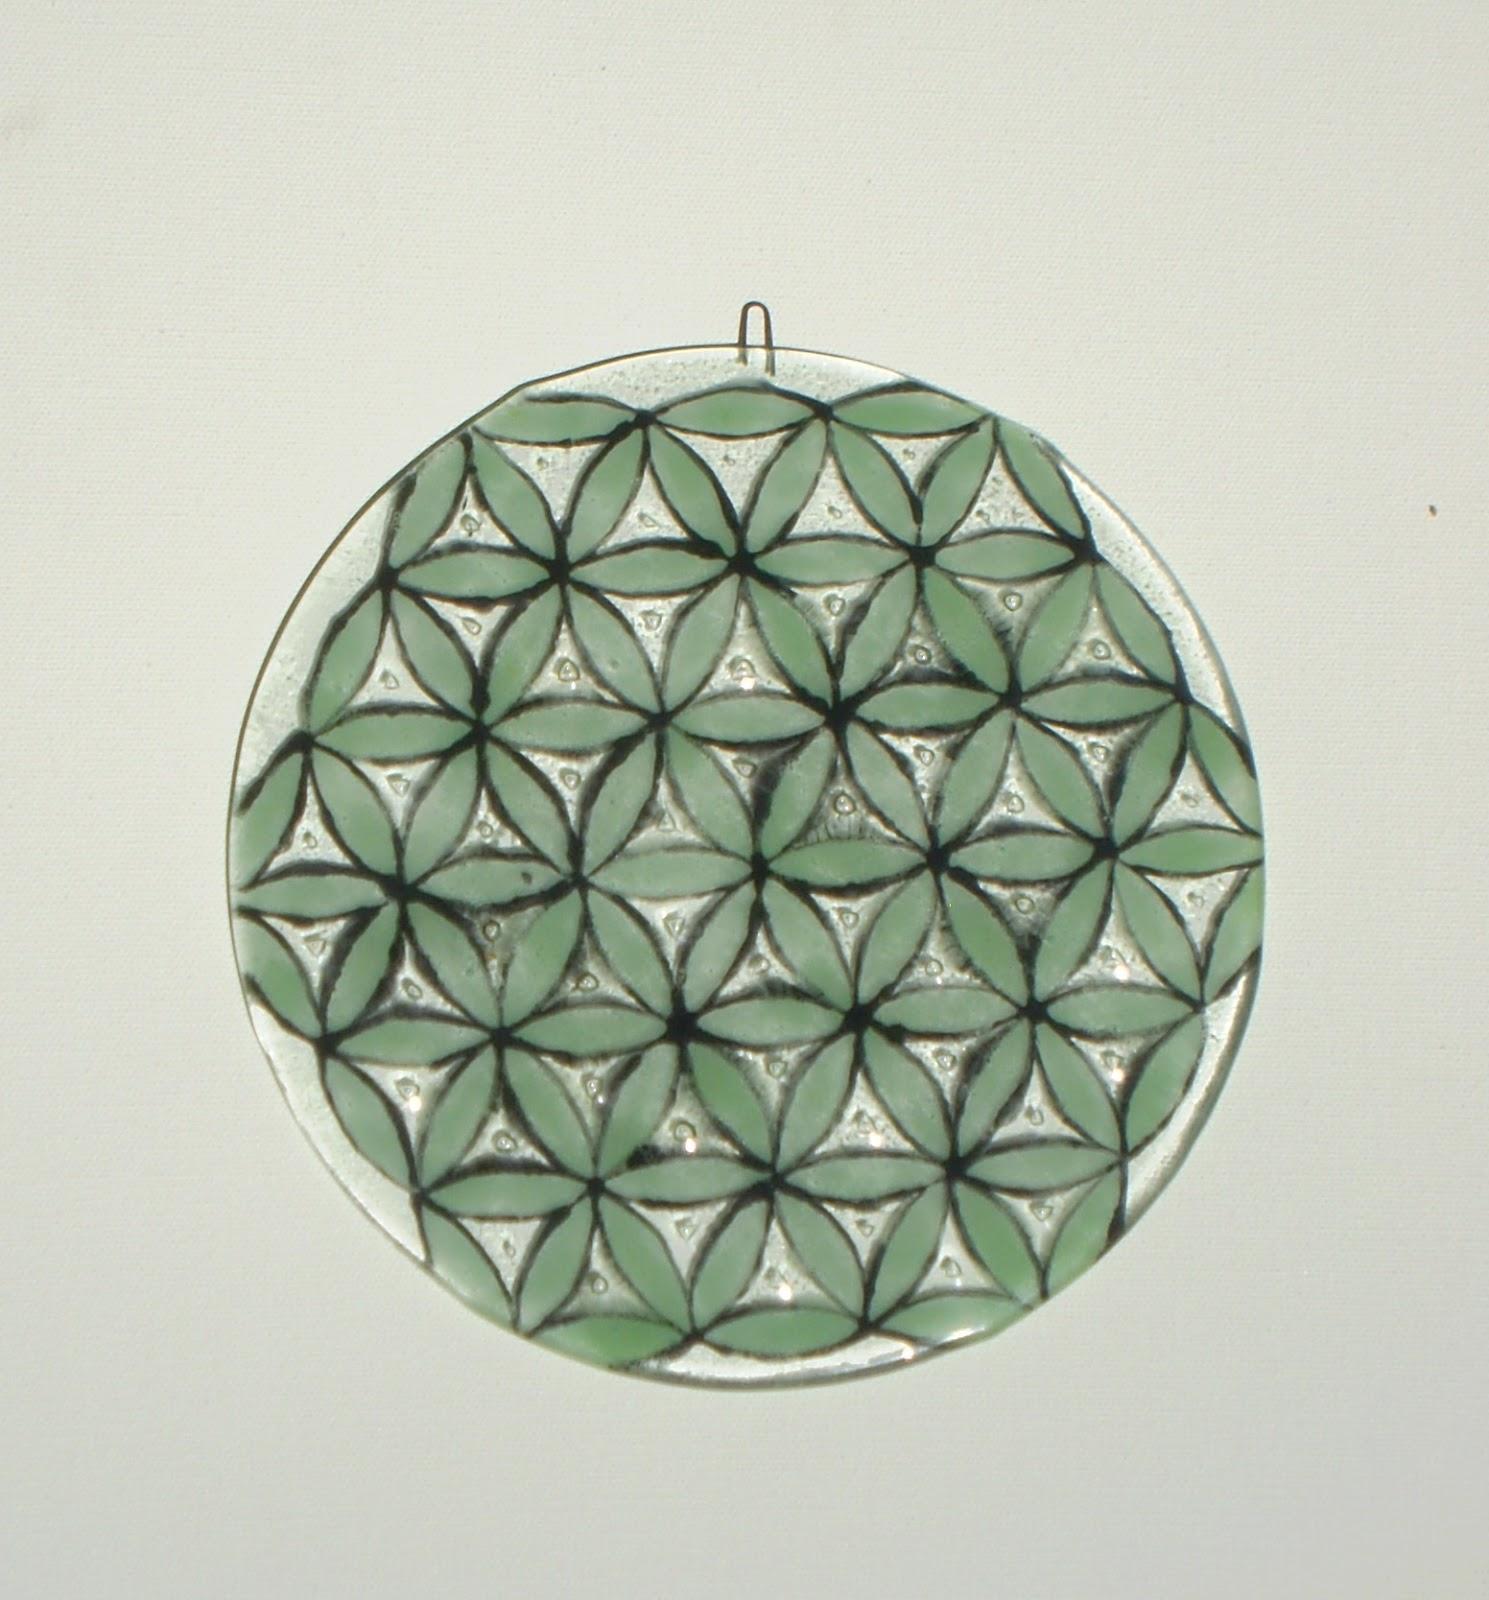 Espacio zen so hum flor de la vida mandala del akash - Espacio zen ...